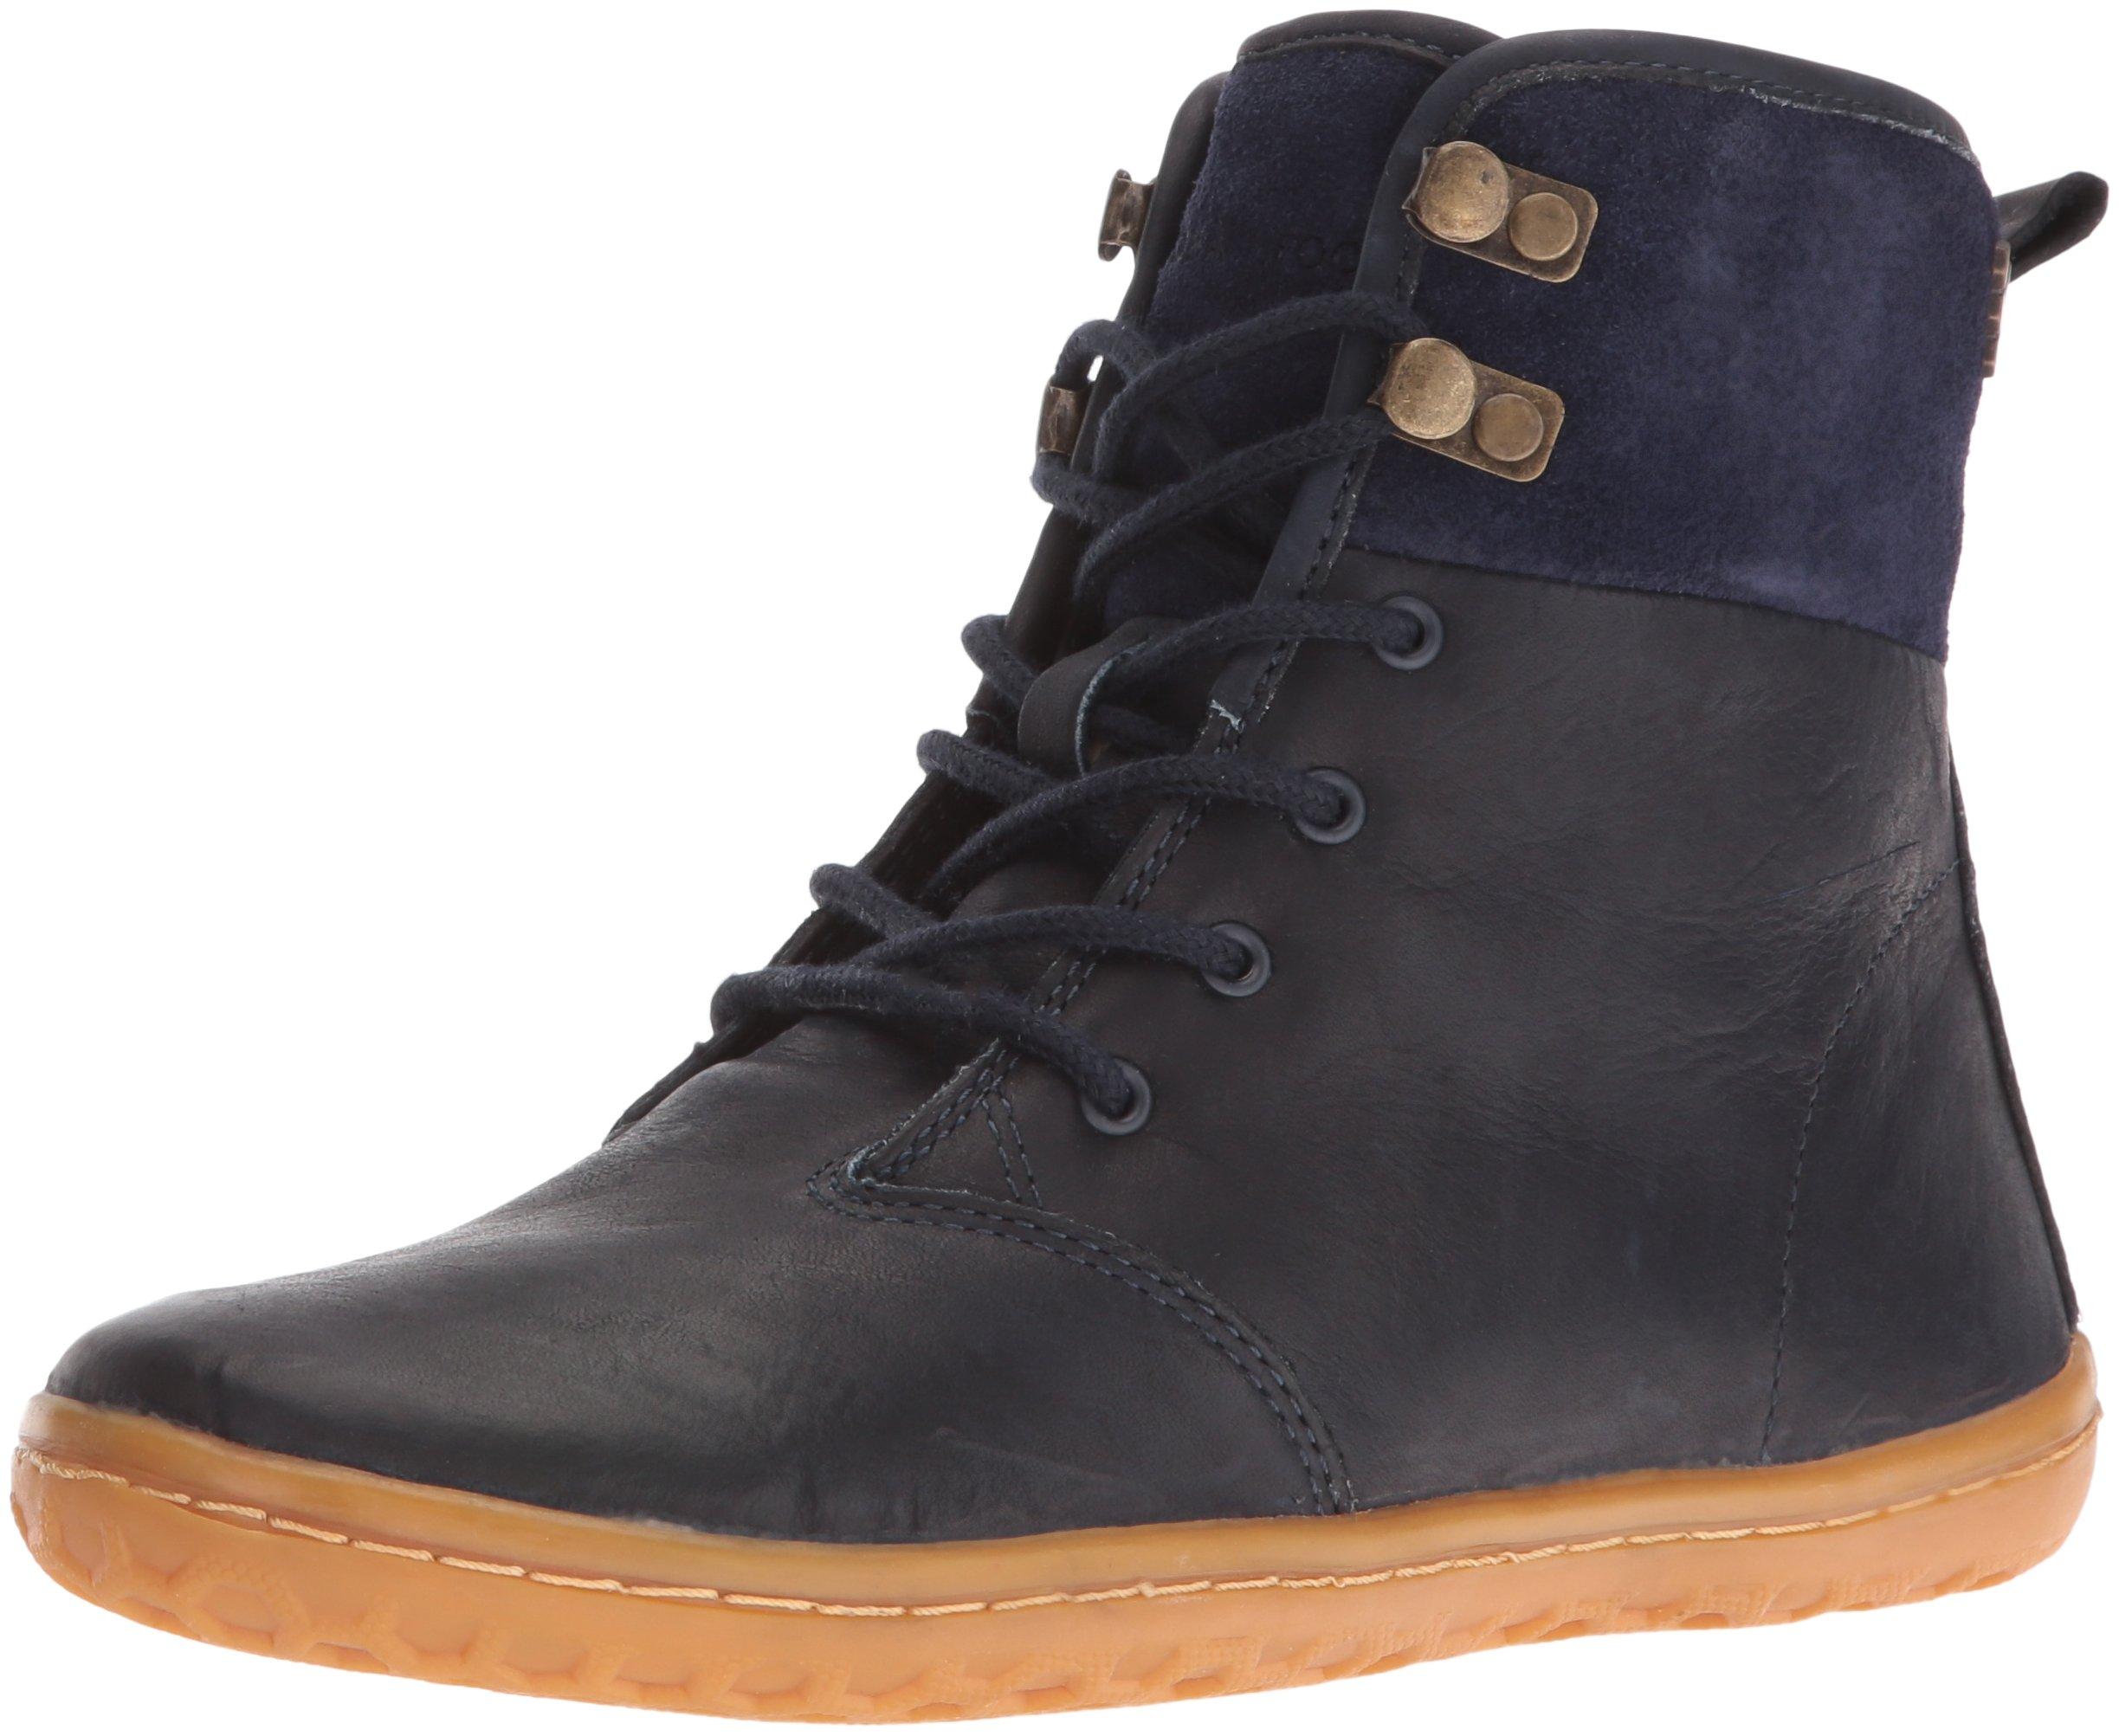 Vivobarefoot Women's Gobi Hi Top l Leather Walking Shoe, Navy/Hyde, 36 EU/6 M US